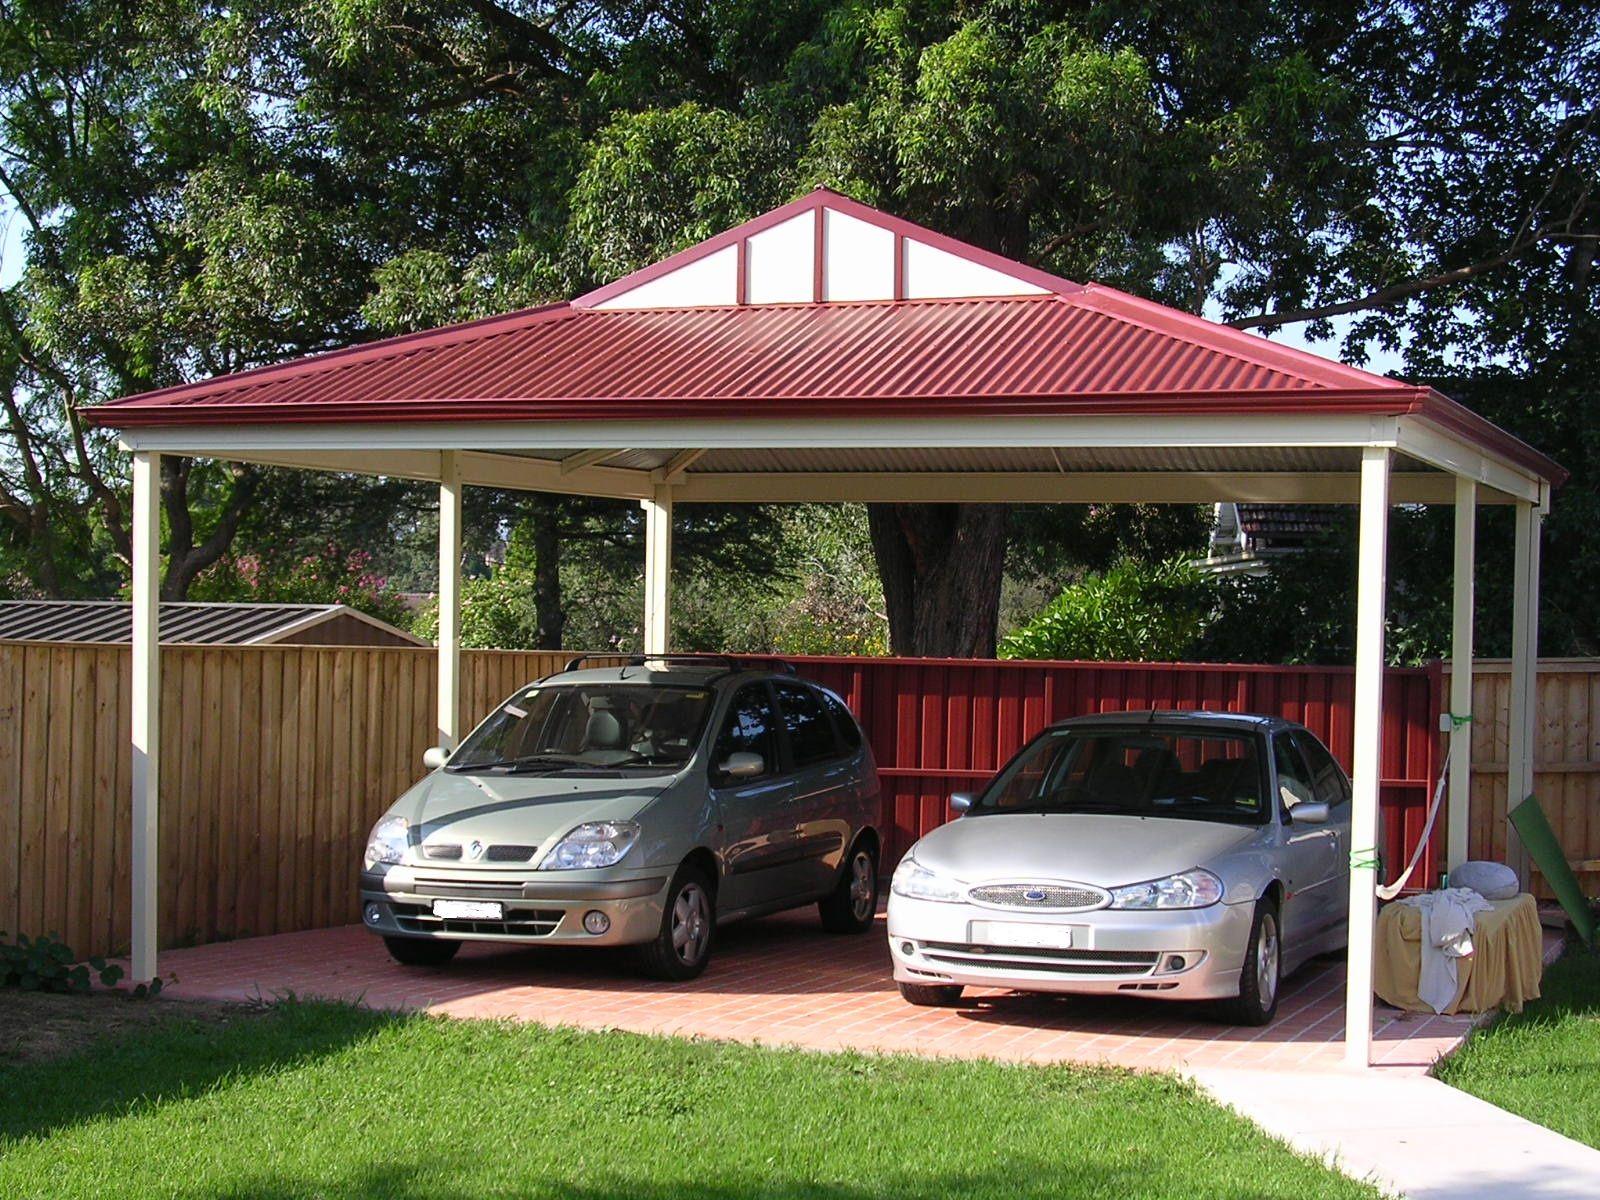 Carport Double Carport Brisbane Outside Concepts Carport Designs Aluminum Carport Double Carport